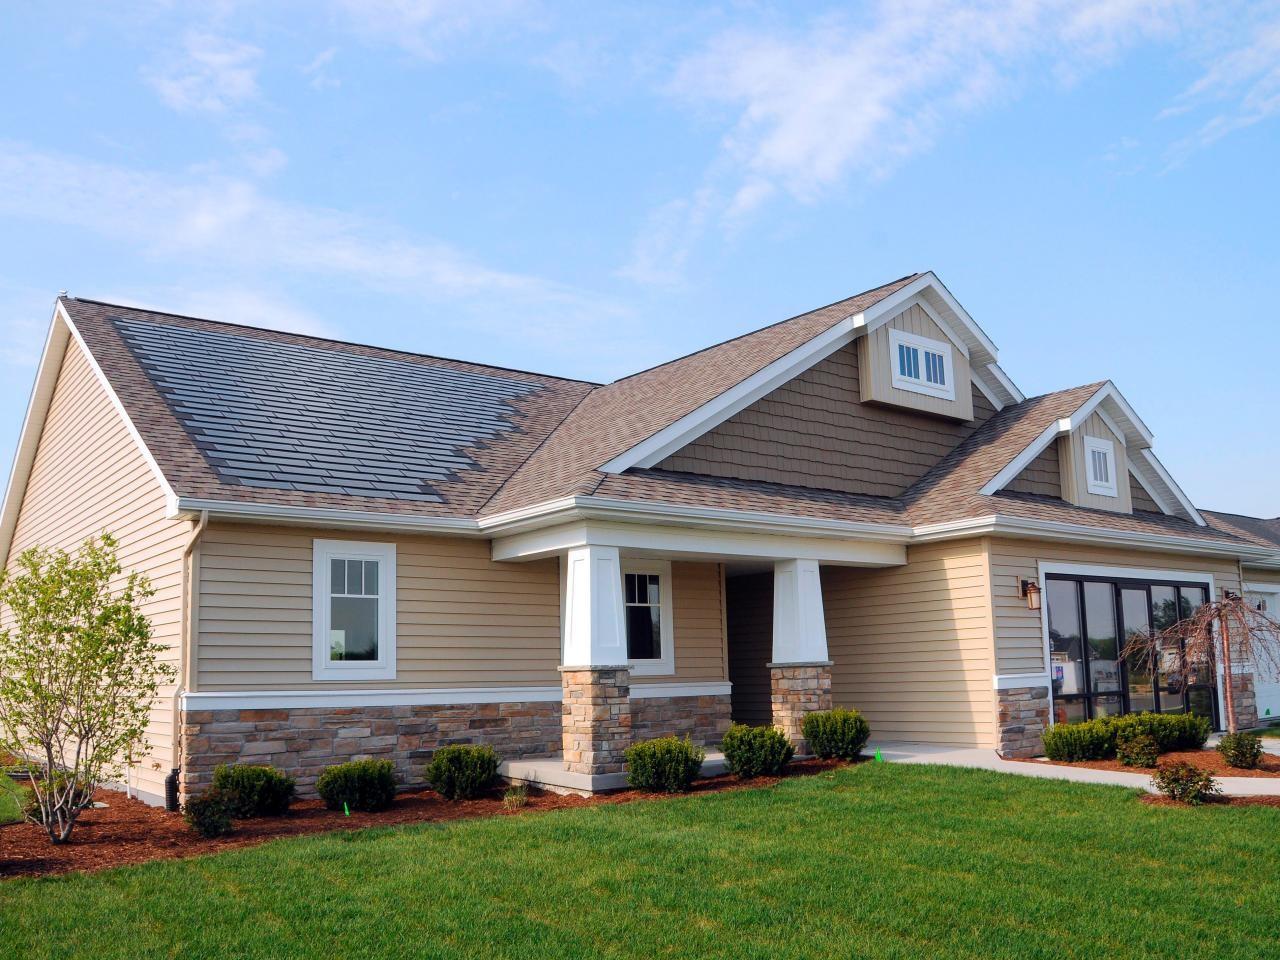 Tesla Solar Roof Vs Apollo And Dow Solar Shingles Home